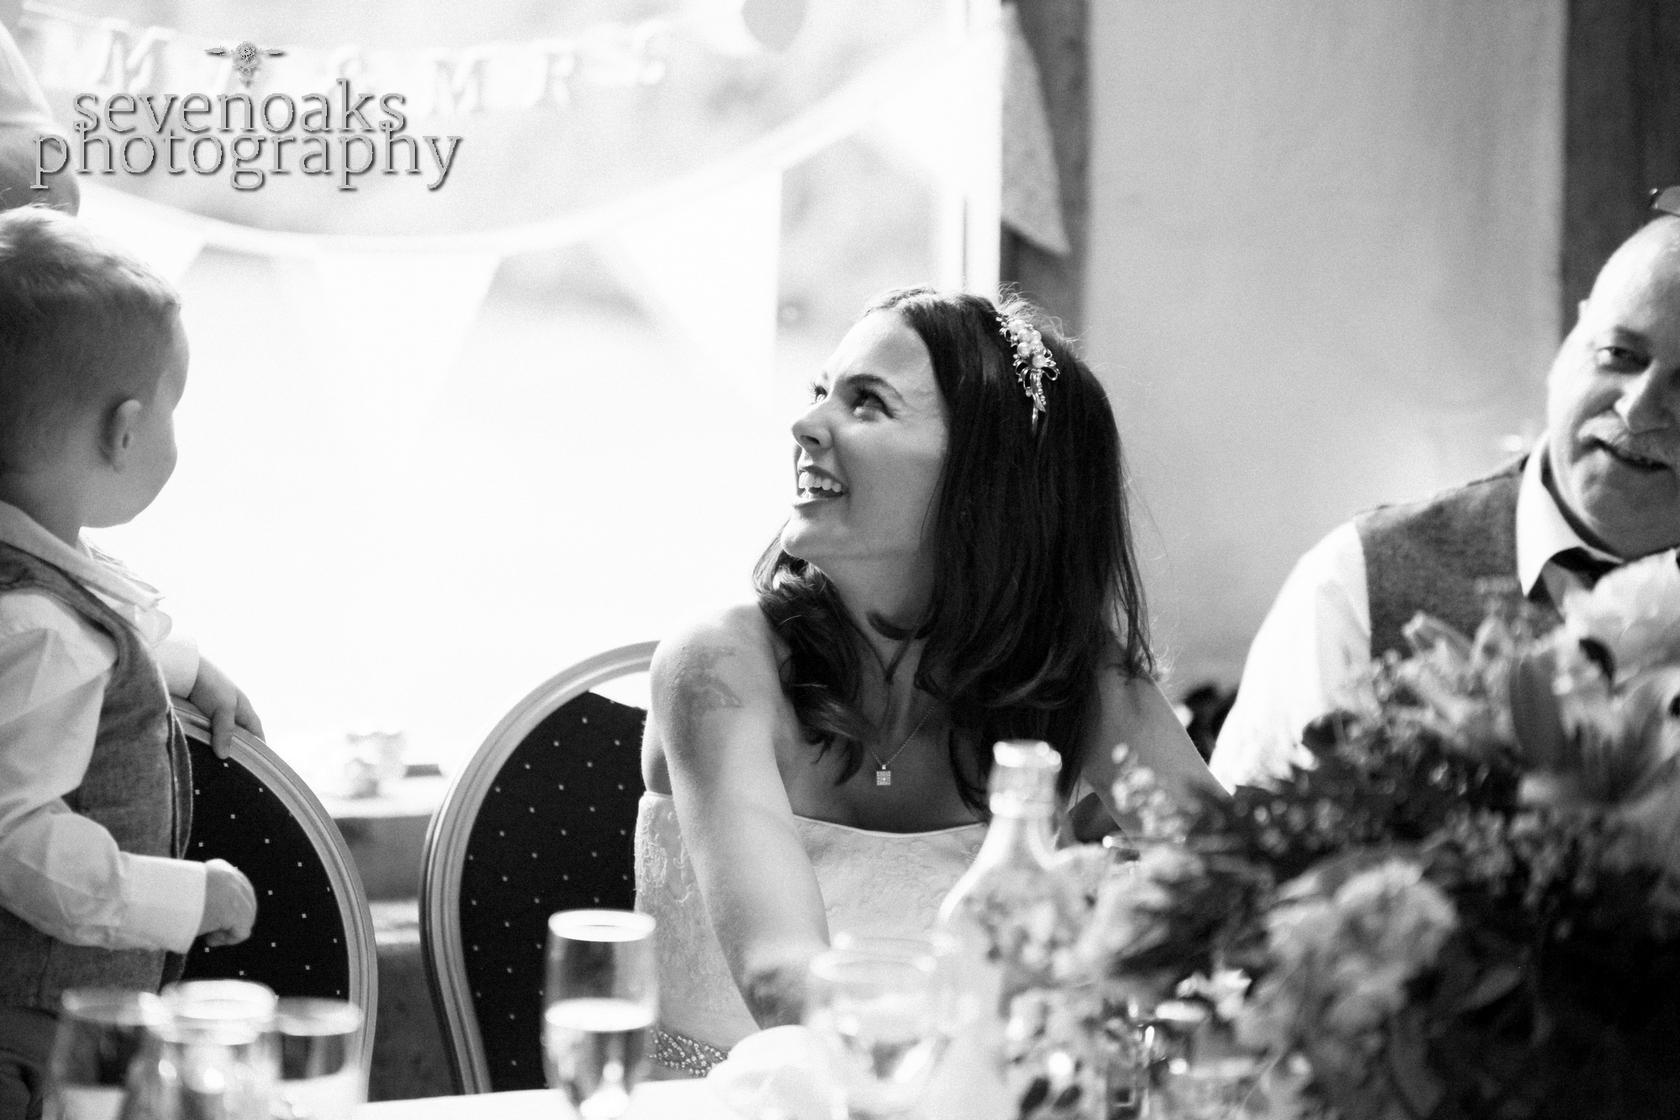 Sevenoaks documentary wedding photographer-58.jpg